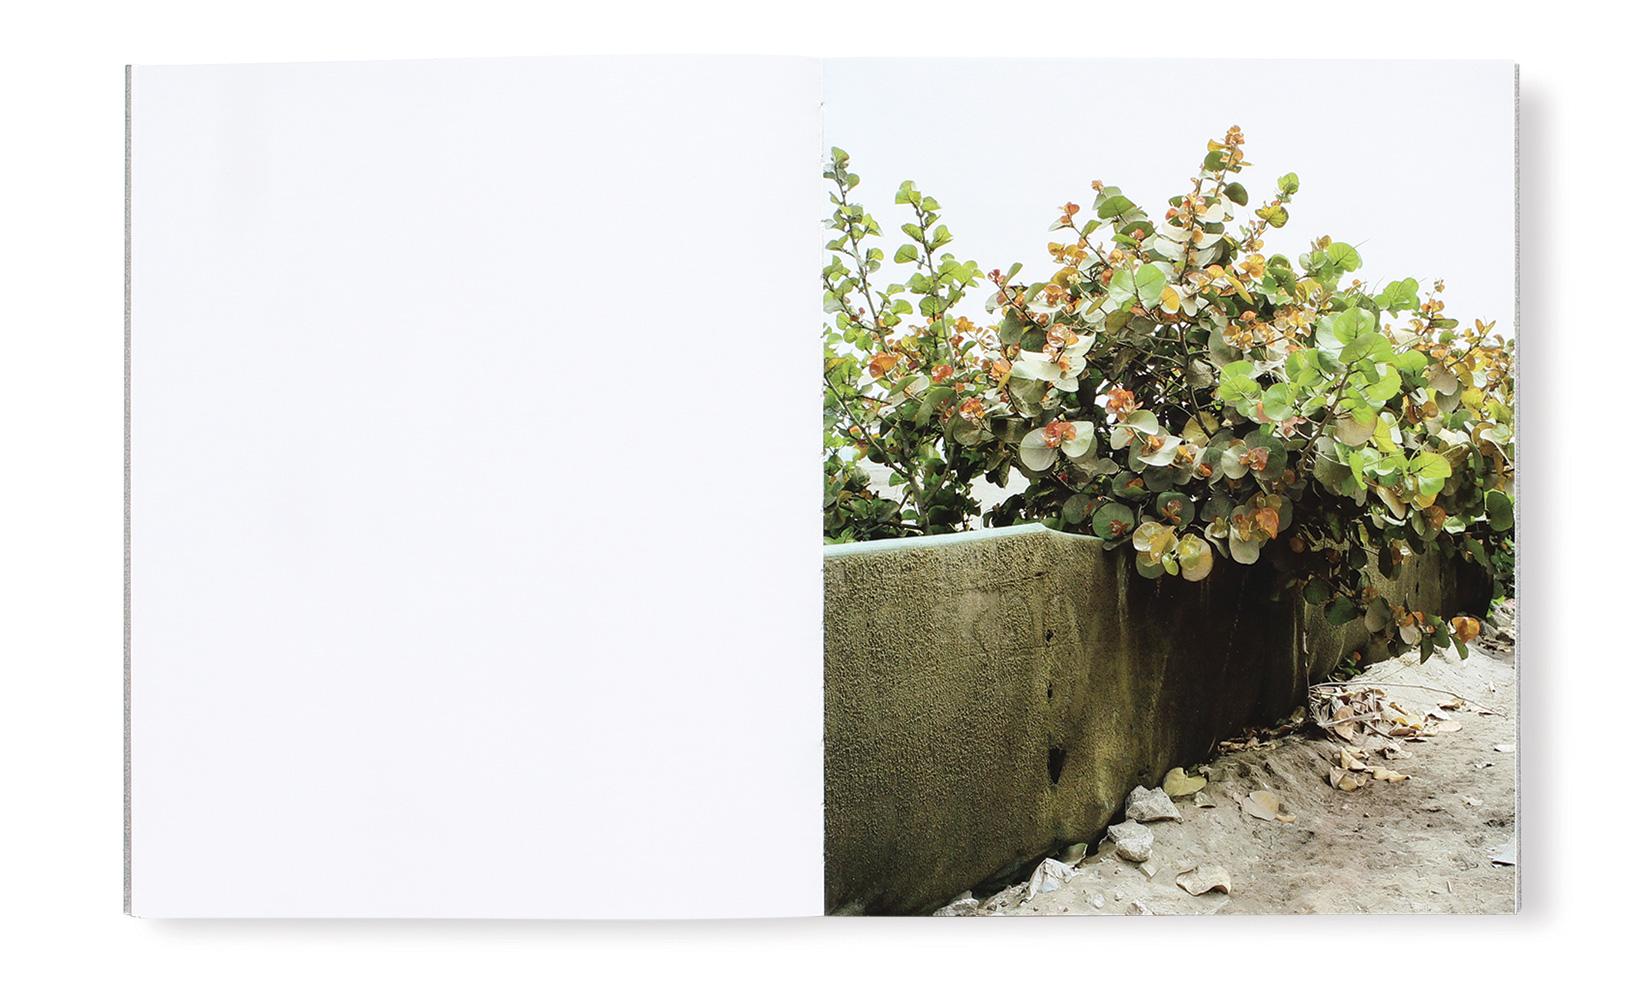 PABLO-HARE-TOLUCA-STUDIO-OLIVIER-ANDREOTTI-04.jpg